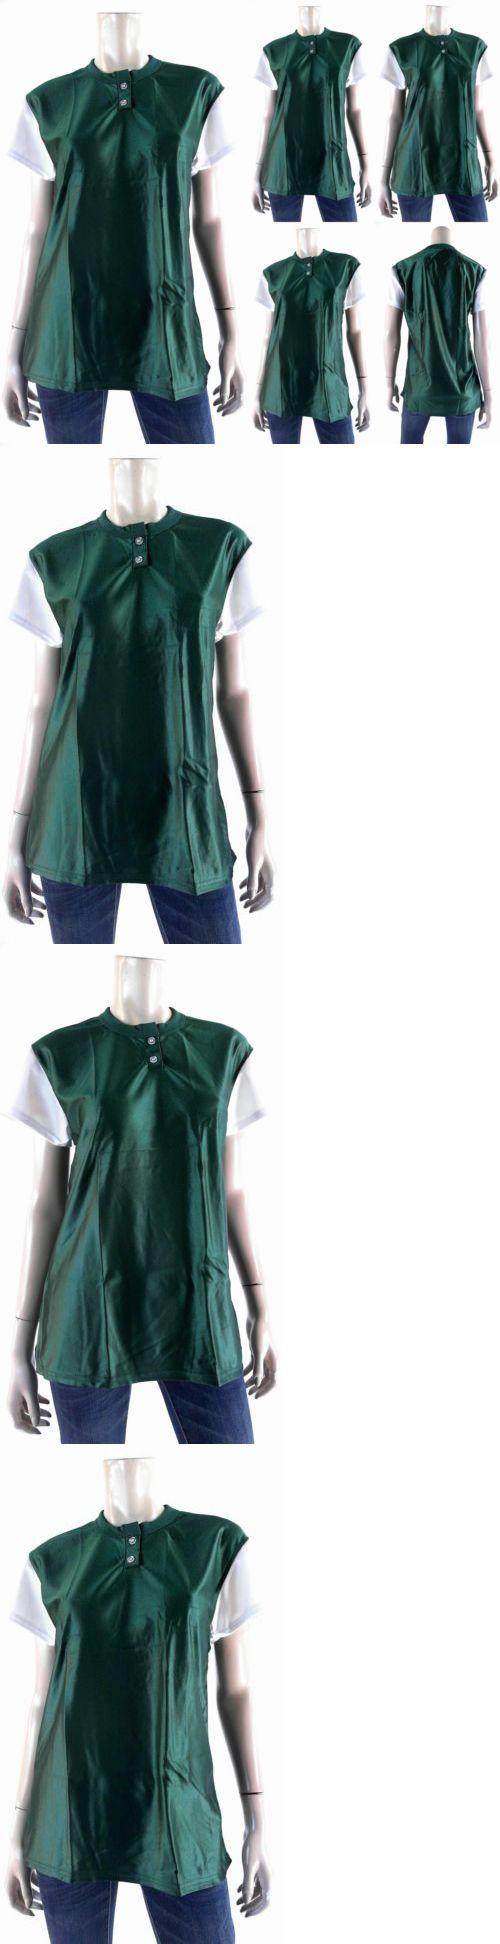 Baseball Shirts and Jerseys 181342: New Venus Unisex Baseball Softball Jersey Blank Top Sport Green Chop BUY IT NOW ONLY: $31.43